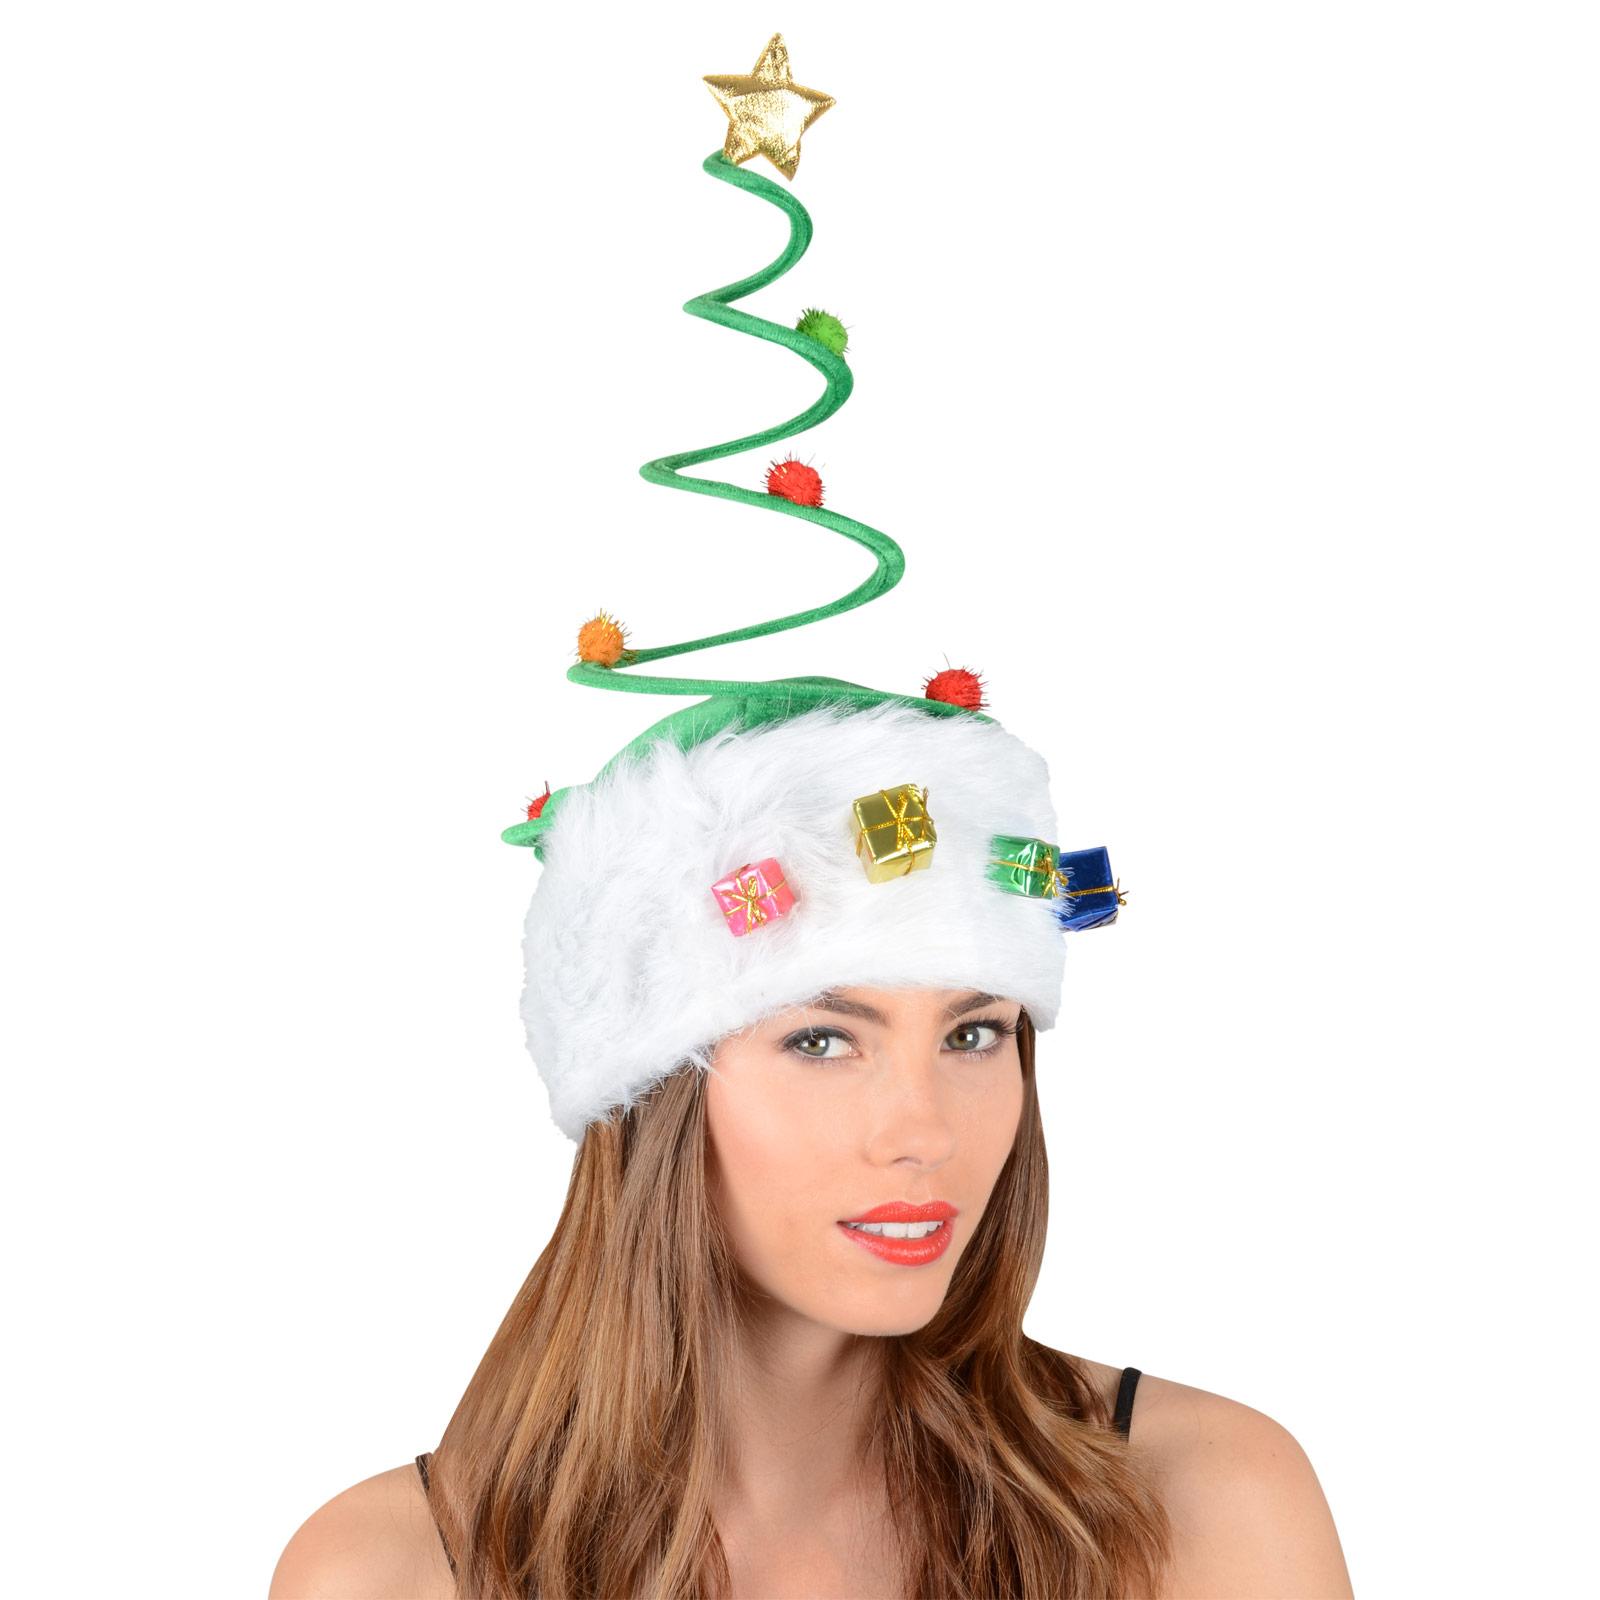 Christmas Tree Hats: Green Plush Spring Christmas Festive Xmas Novelty Tree Hat